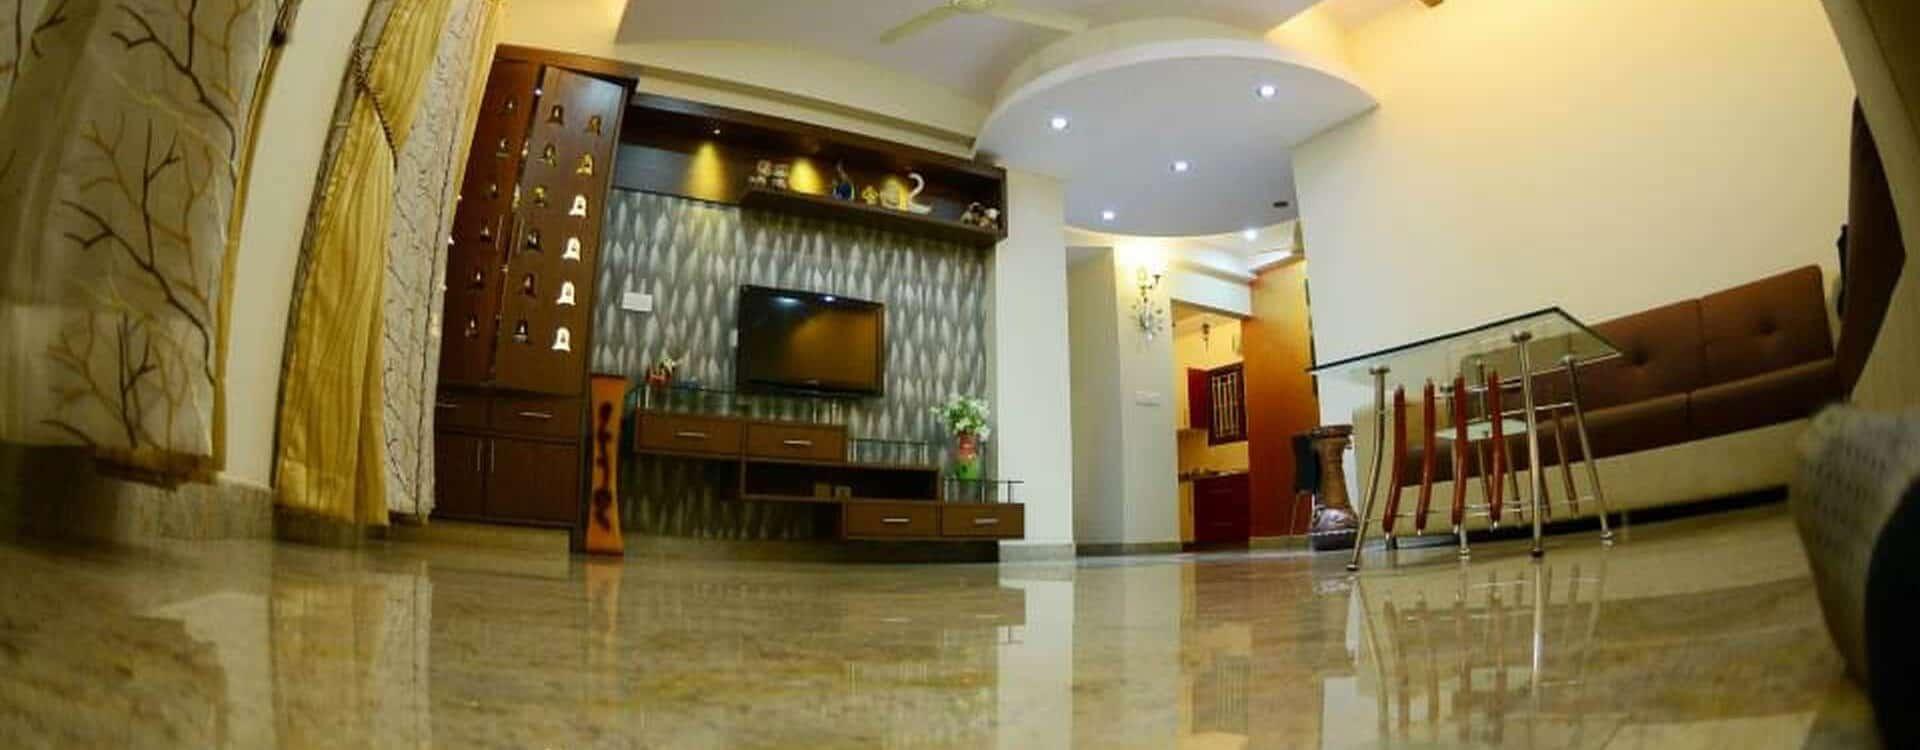 Mr. Dinesh Karkera's Residence at Jeppu Mangalore